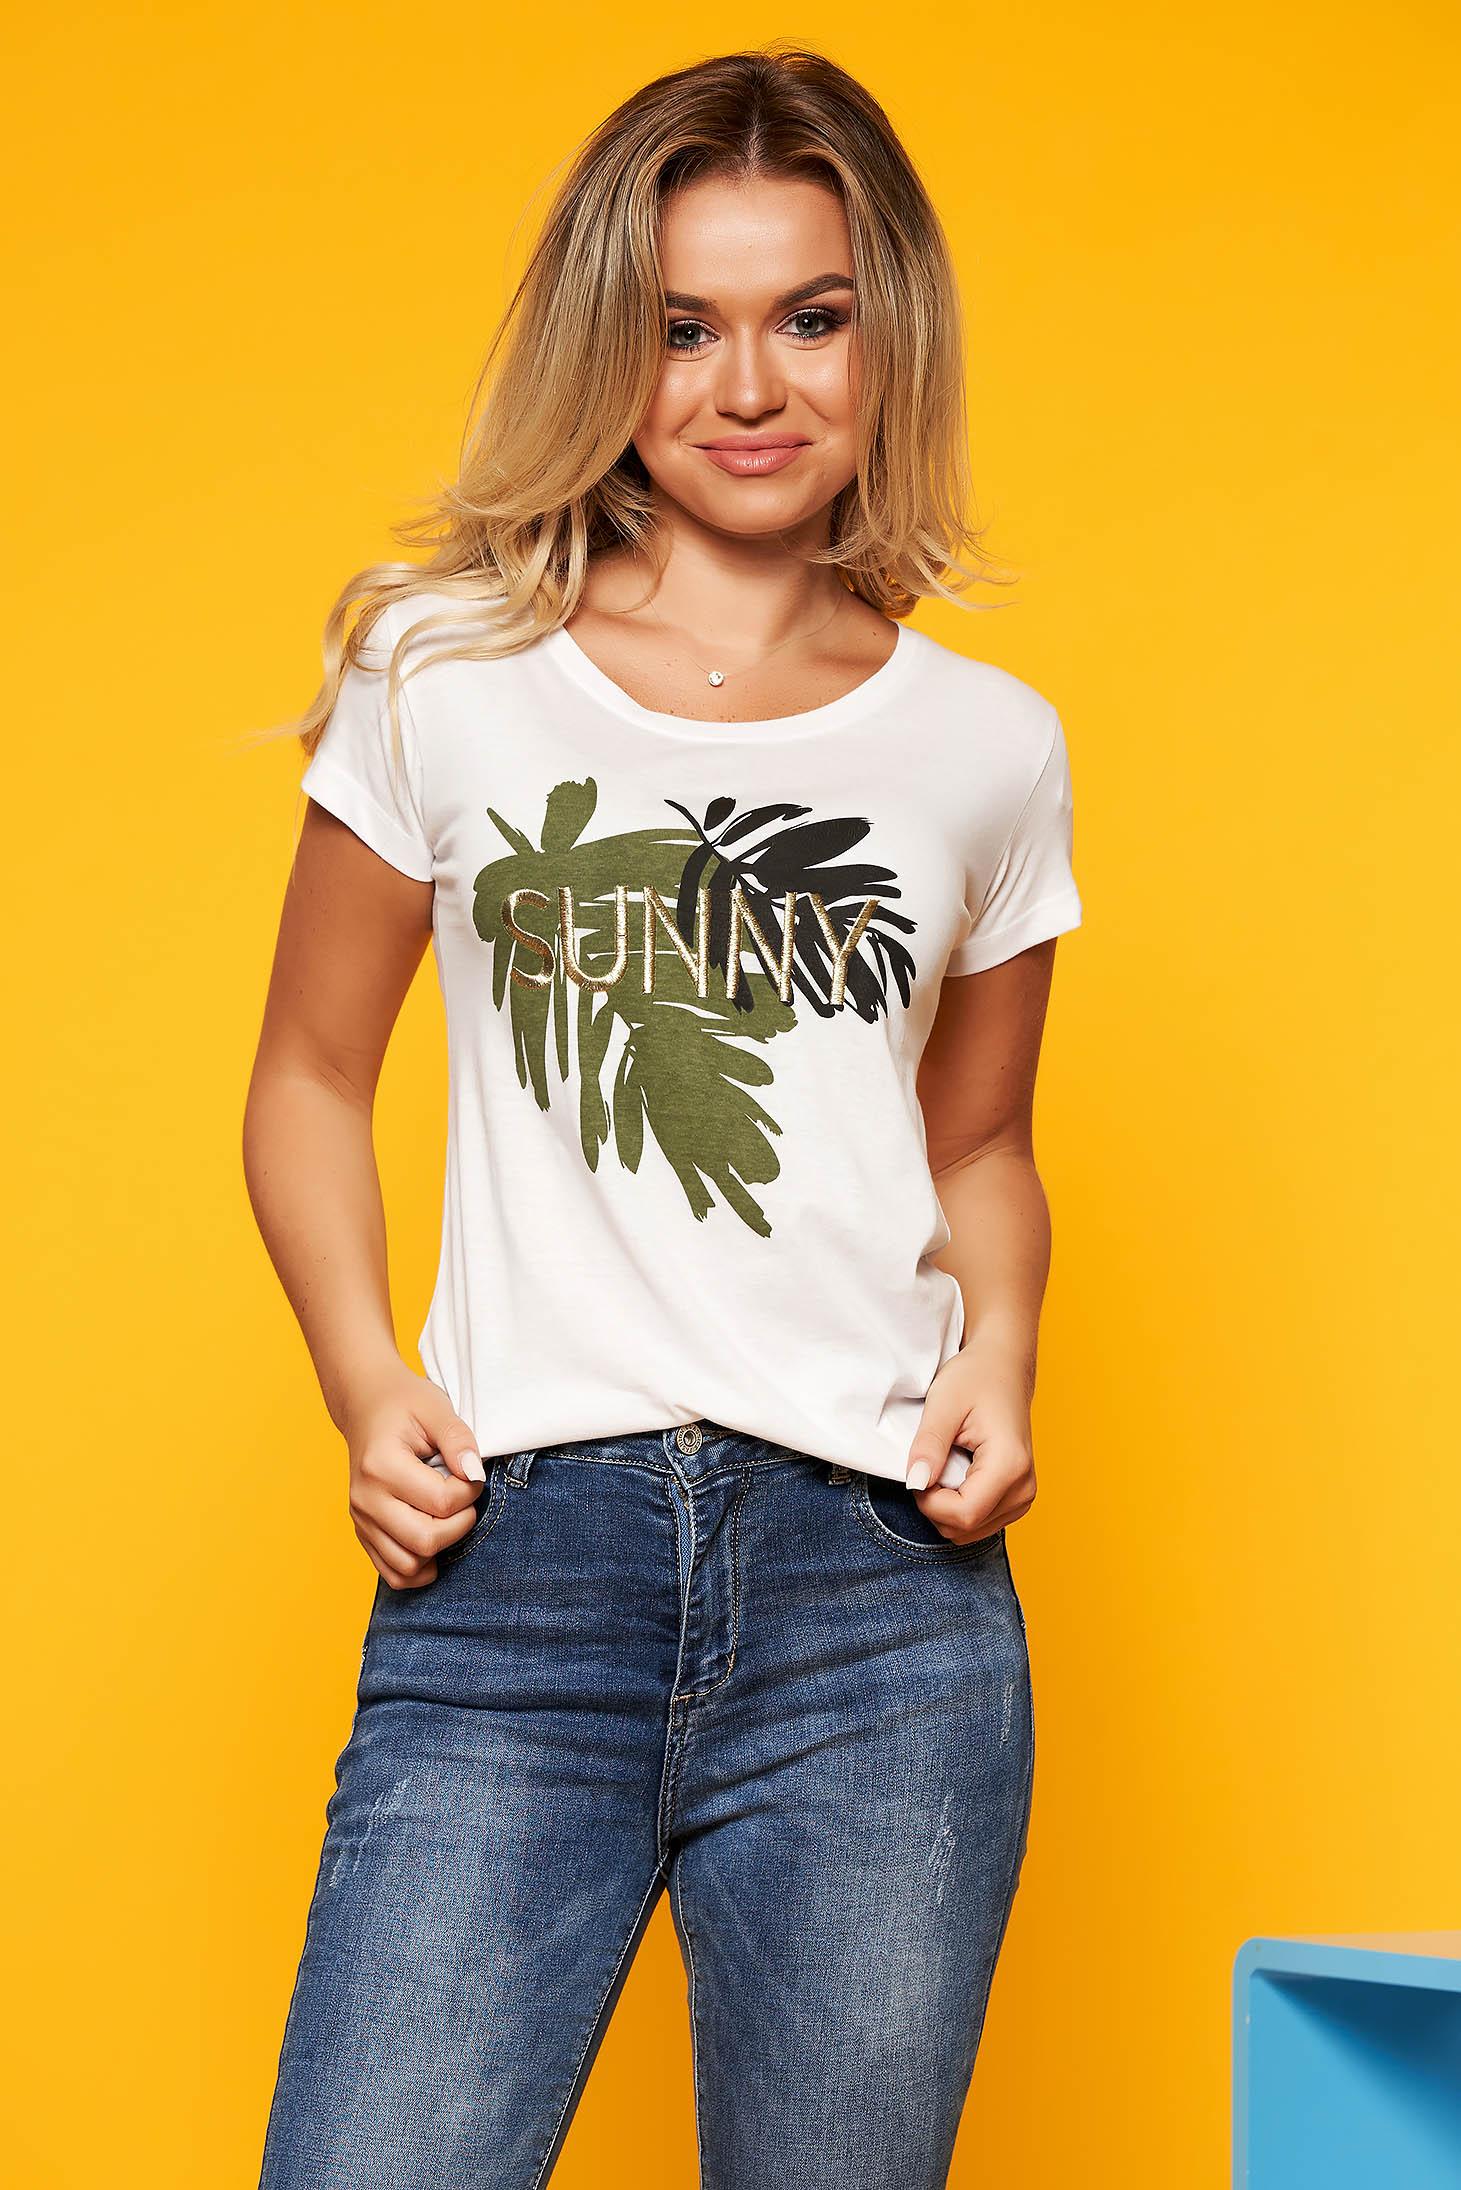 Top Secret white casual short cut flared t-shirt cotton